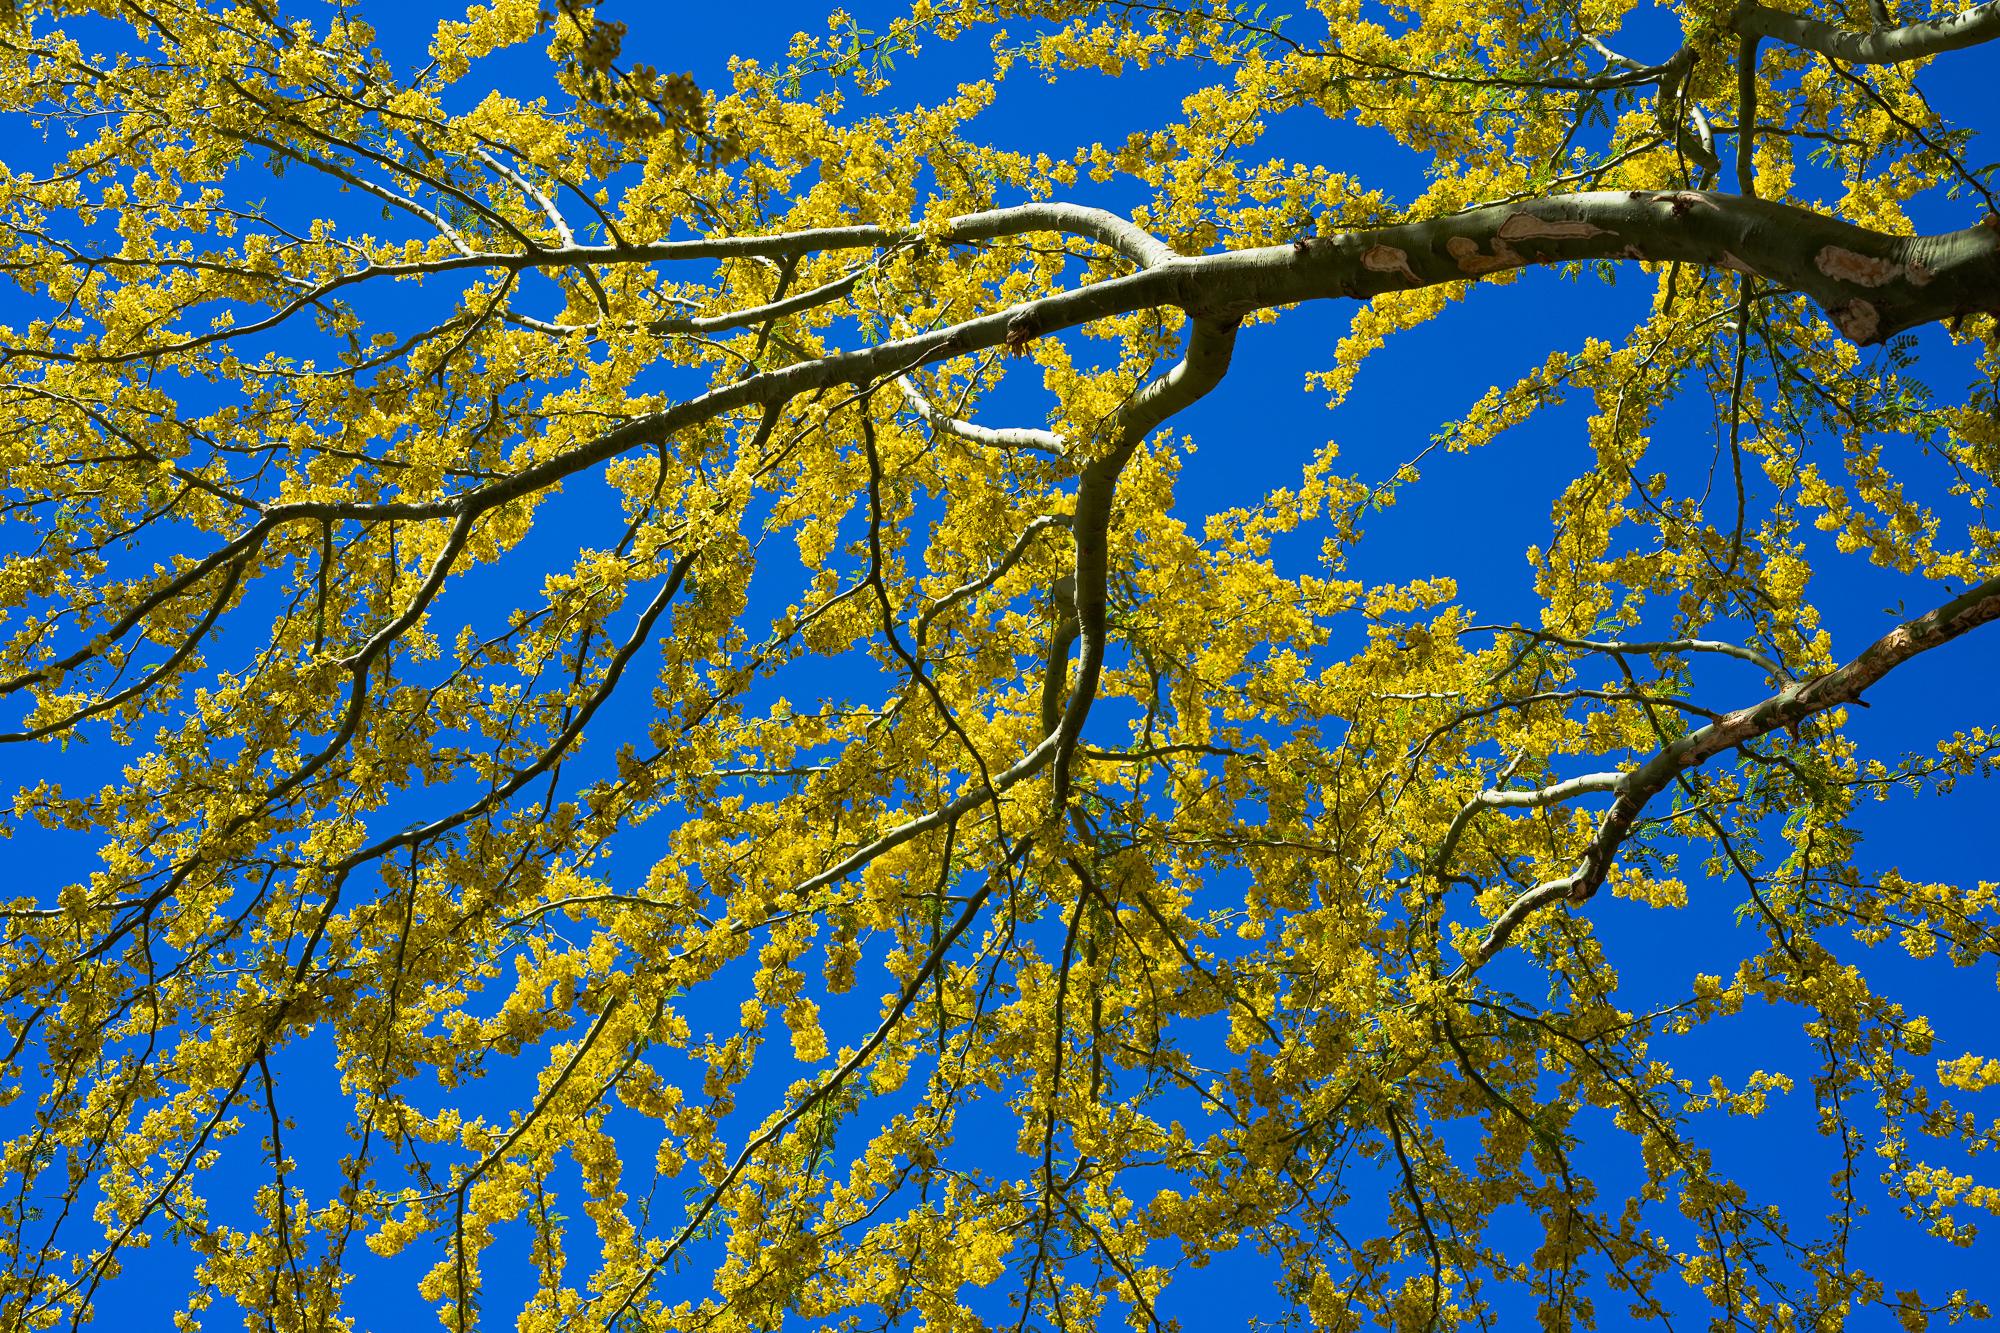 Palo Verde Blooms Illuminated by SkyLight